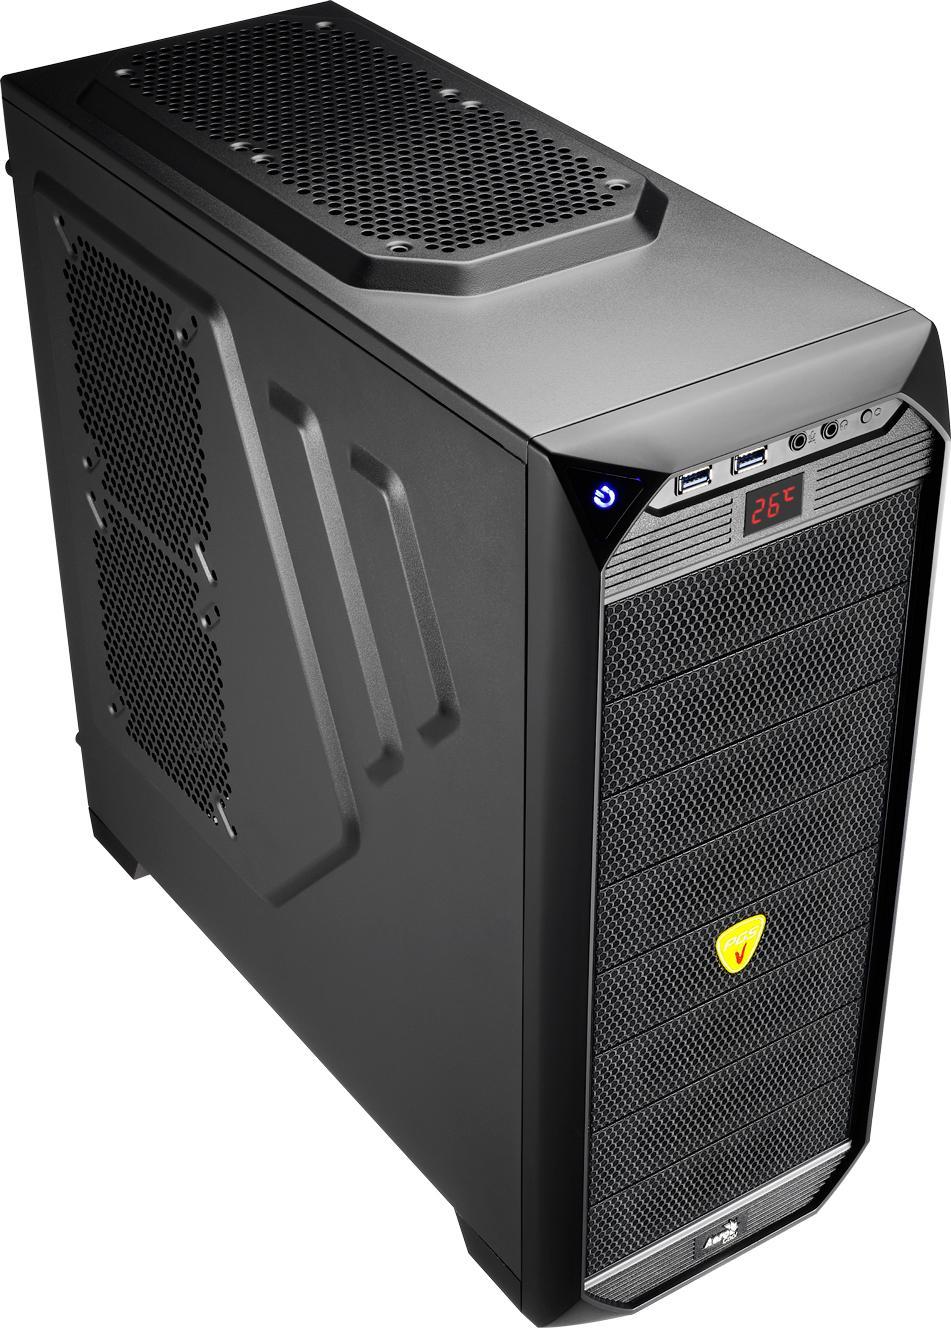 Vs-92 Black Edition